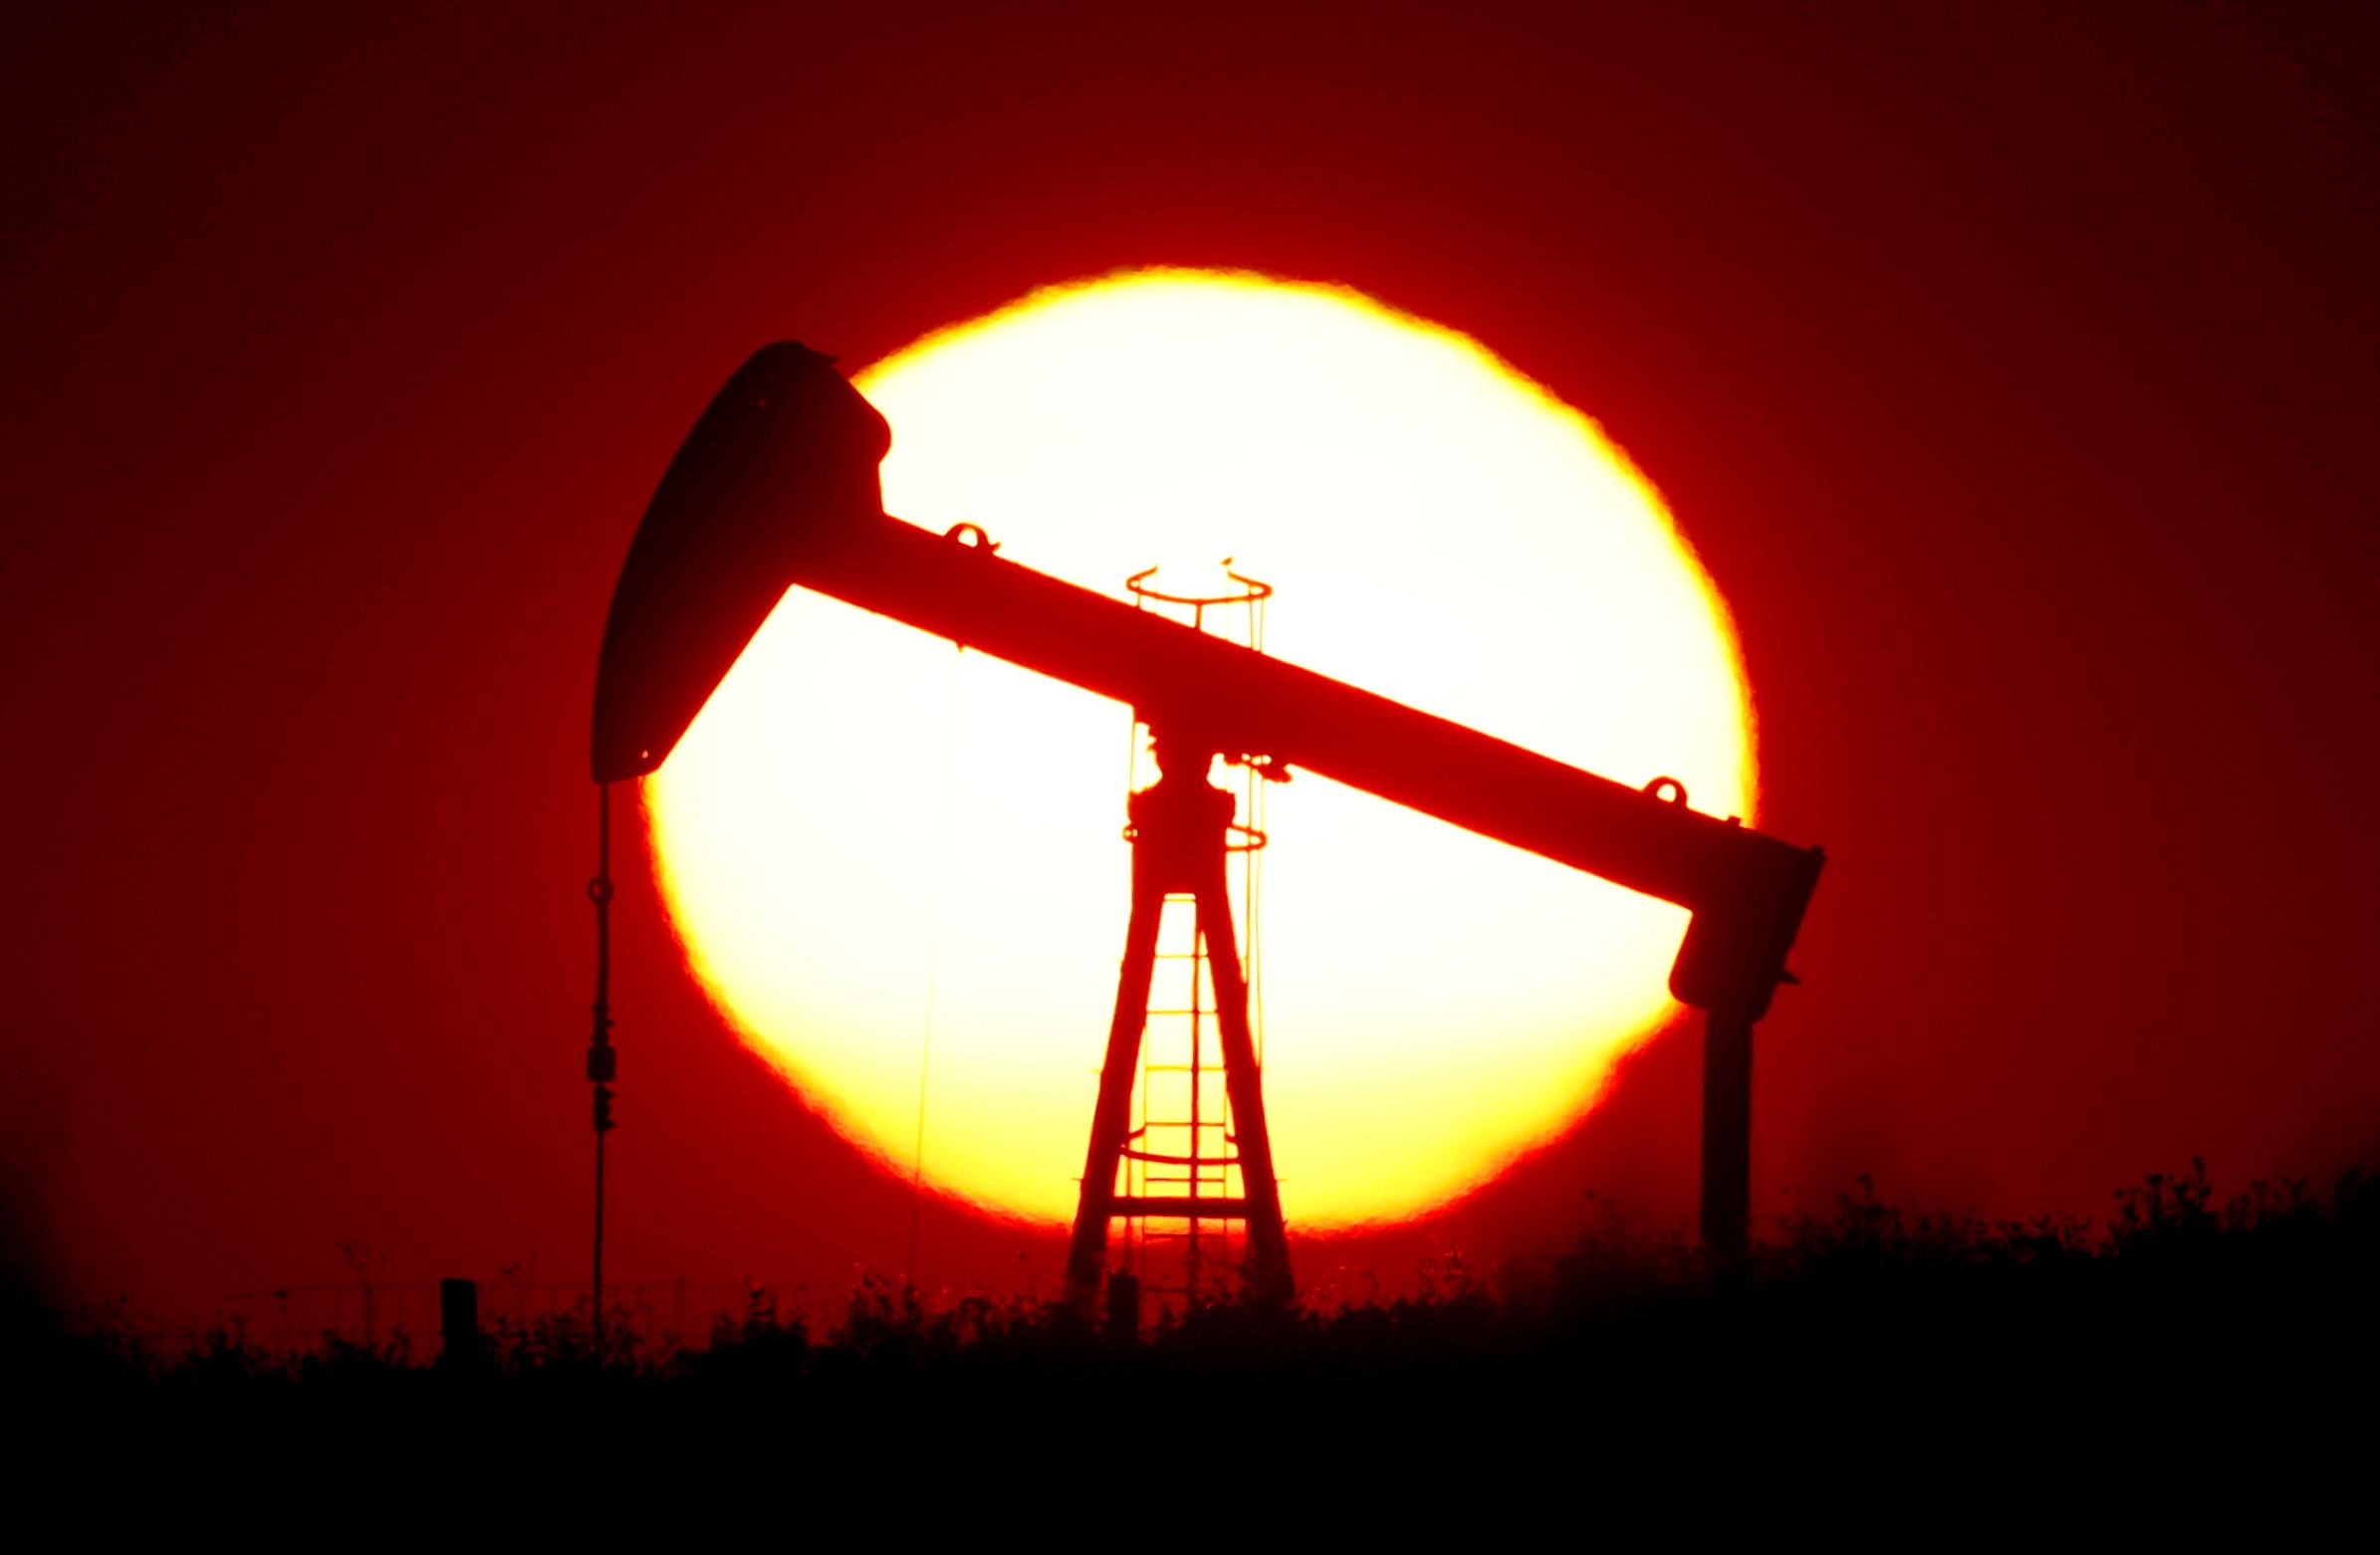 The sun sets behind an oil pump outside Saint-Fiacre, near Paris, France September 17, 2019. REUTERS/Christian Hartmann/File Photo